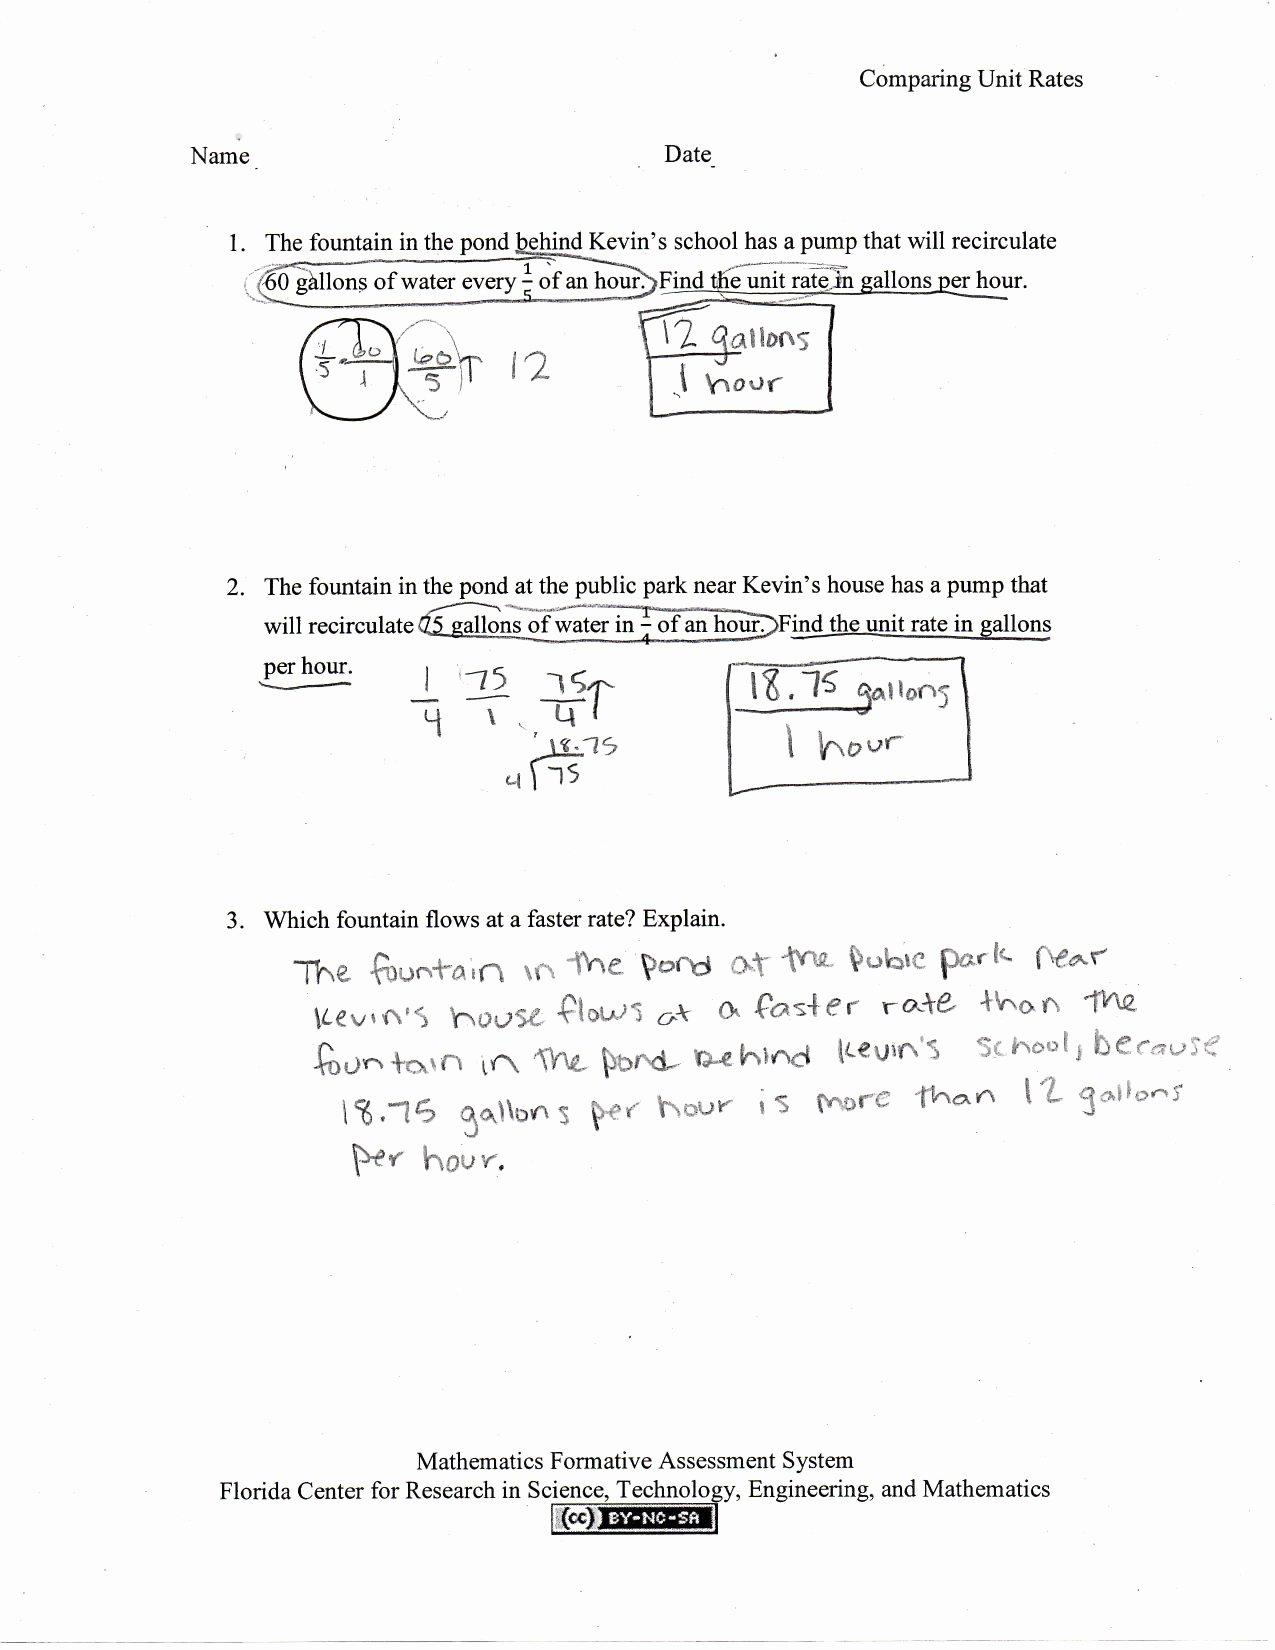 Finding Unit Rates Worksheet Inspirational Paring Unit Rates